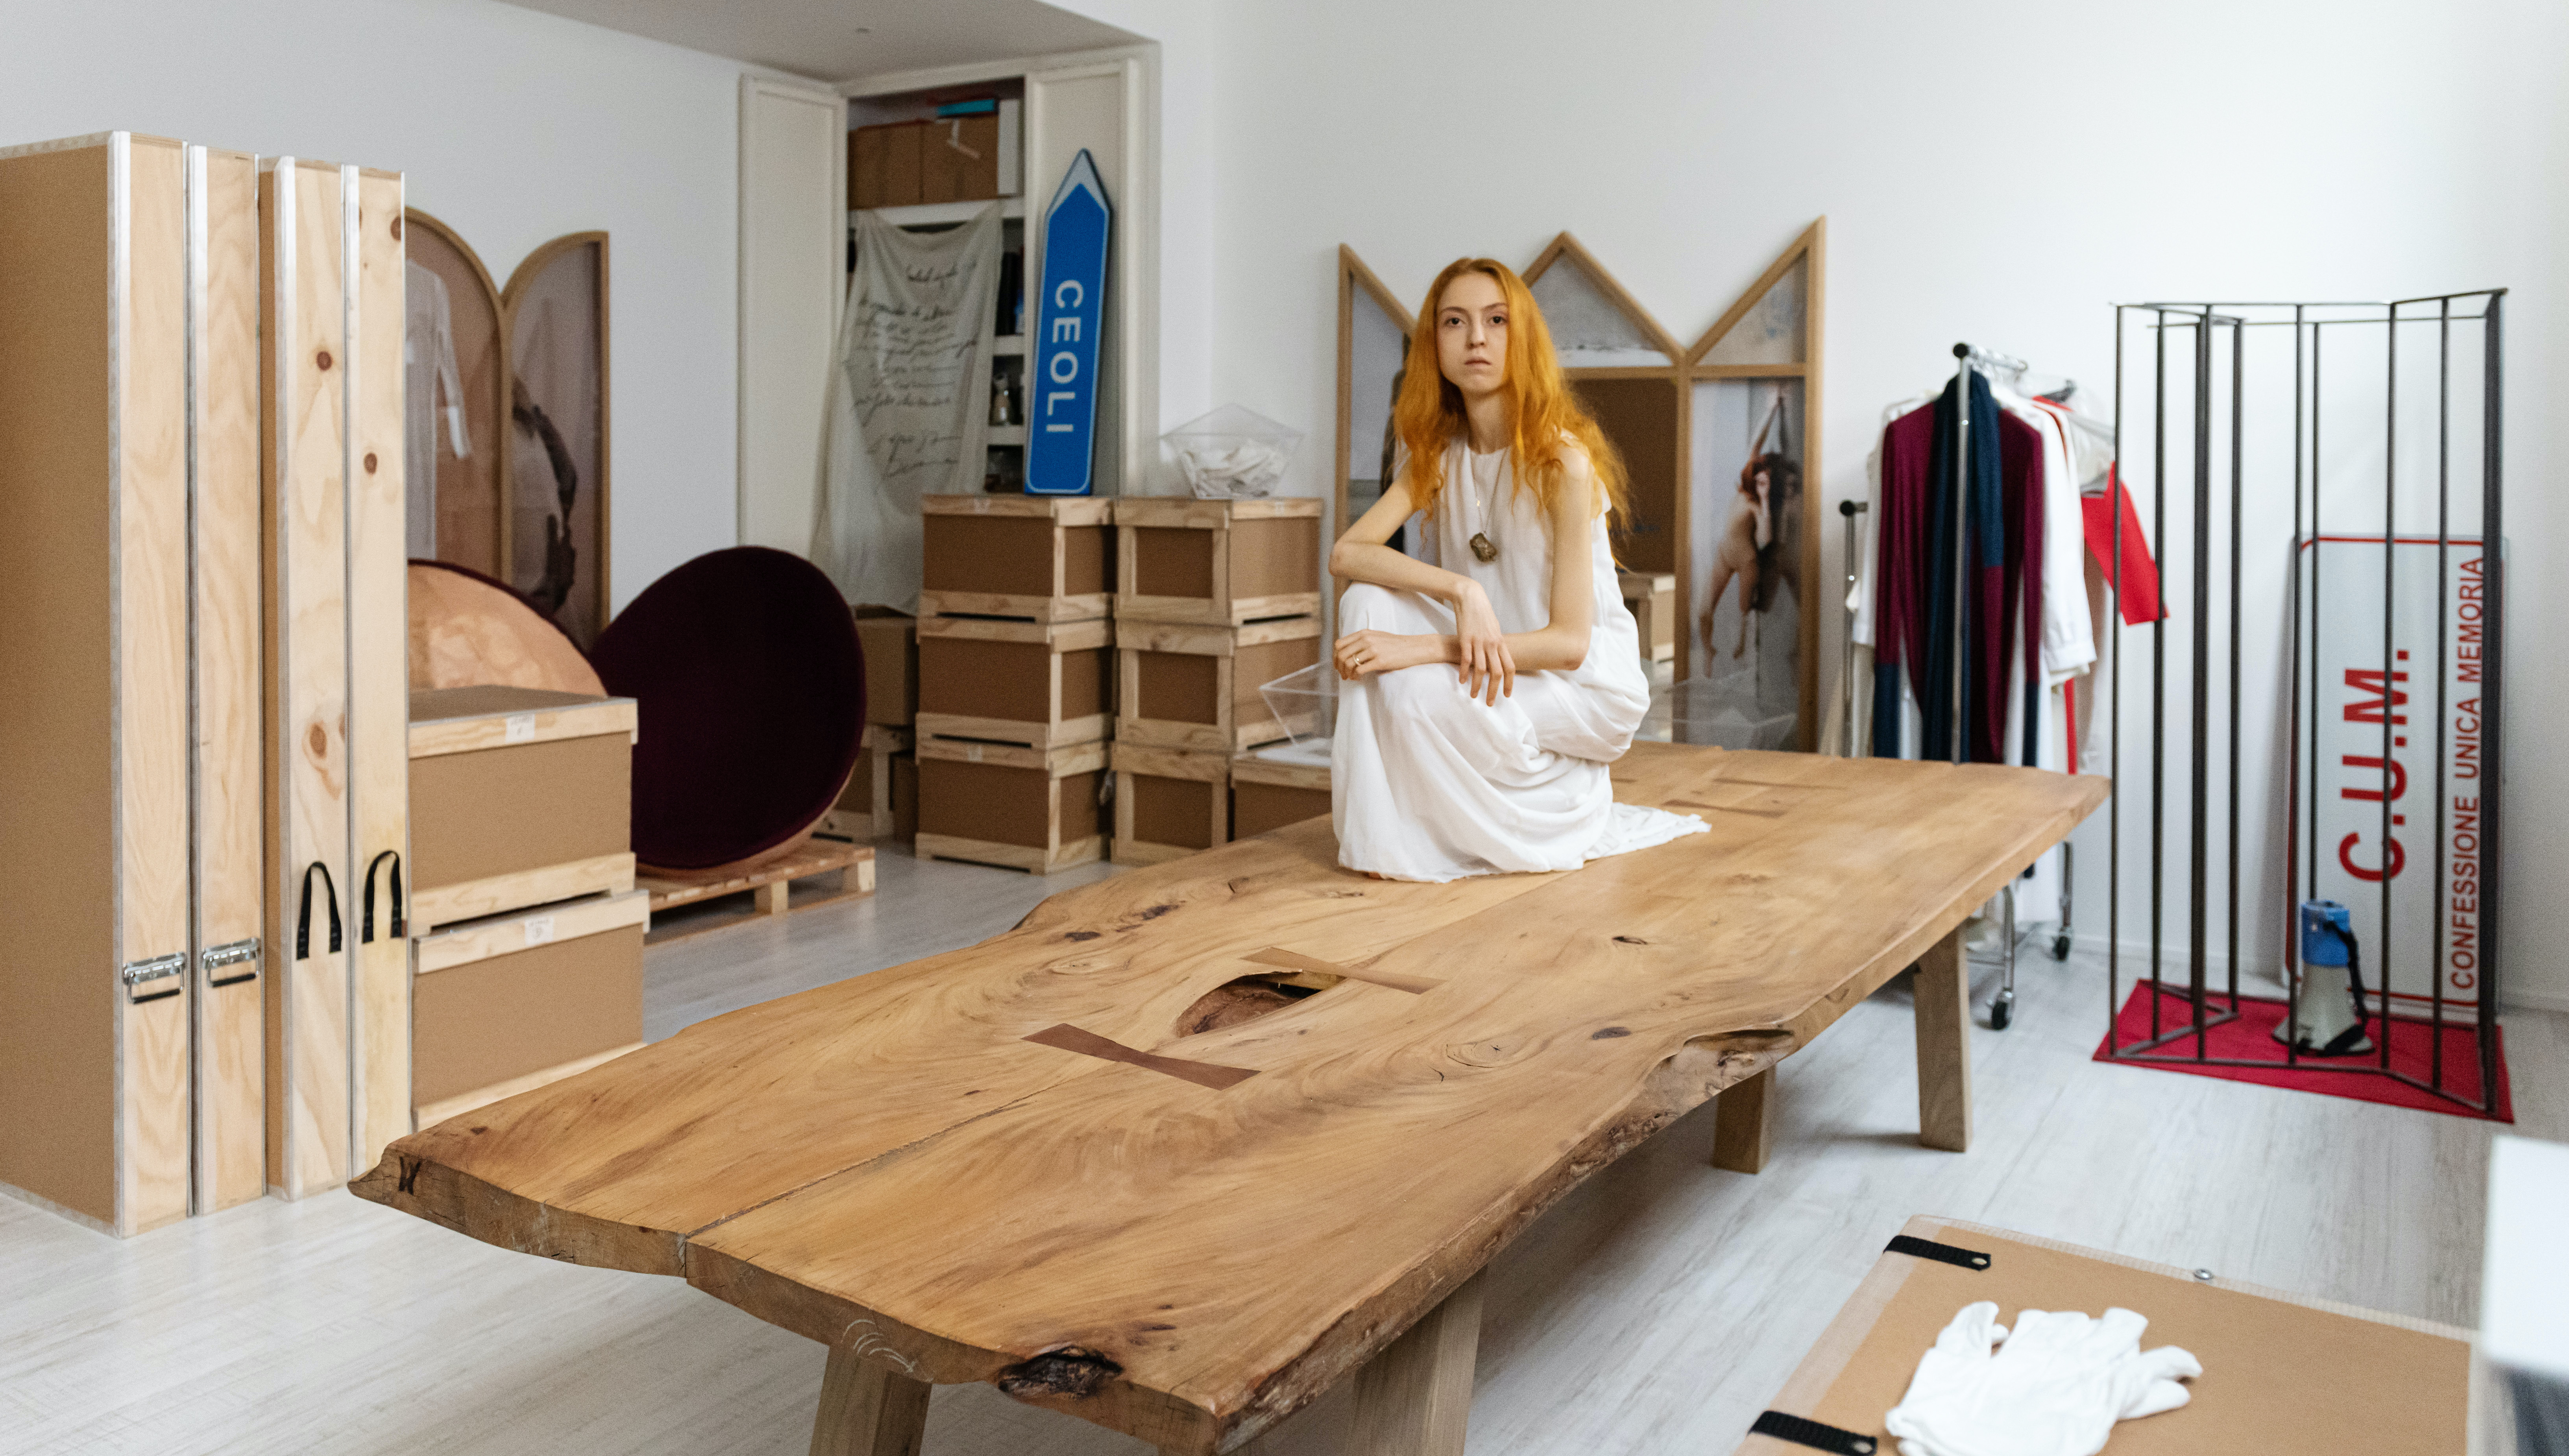 Reverie, studio d'artista, Milano 2020-2021